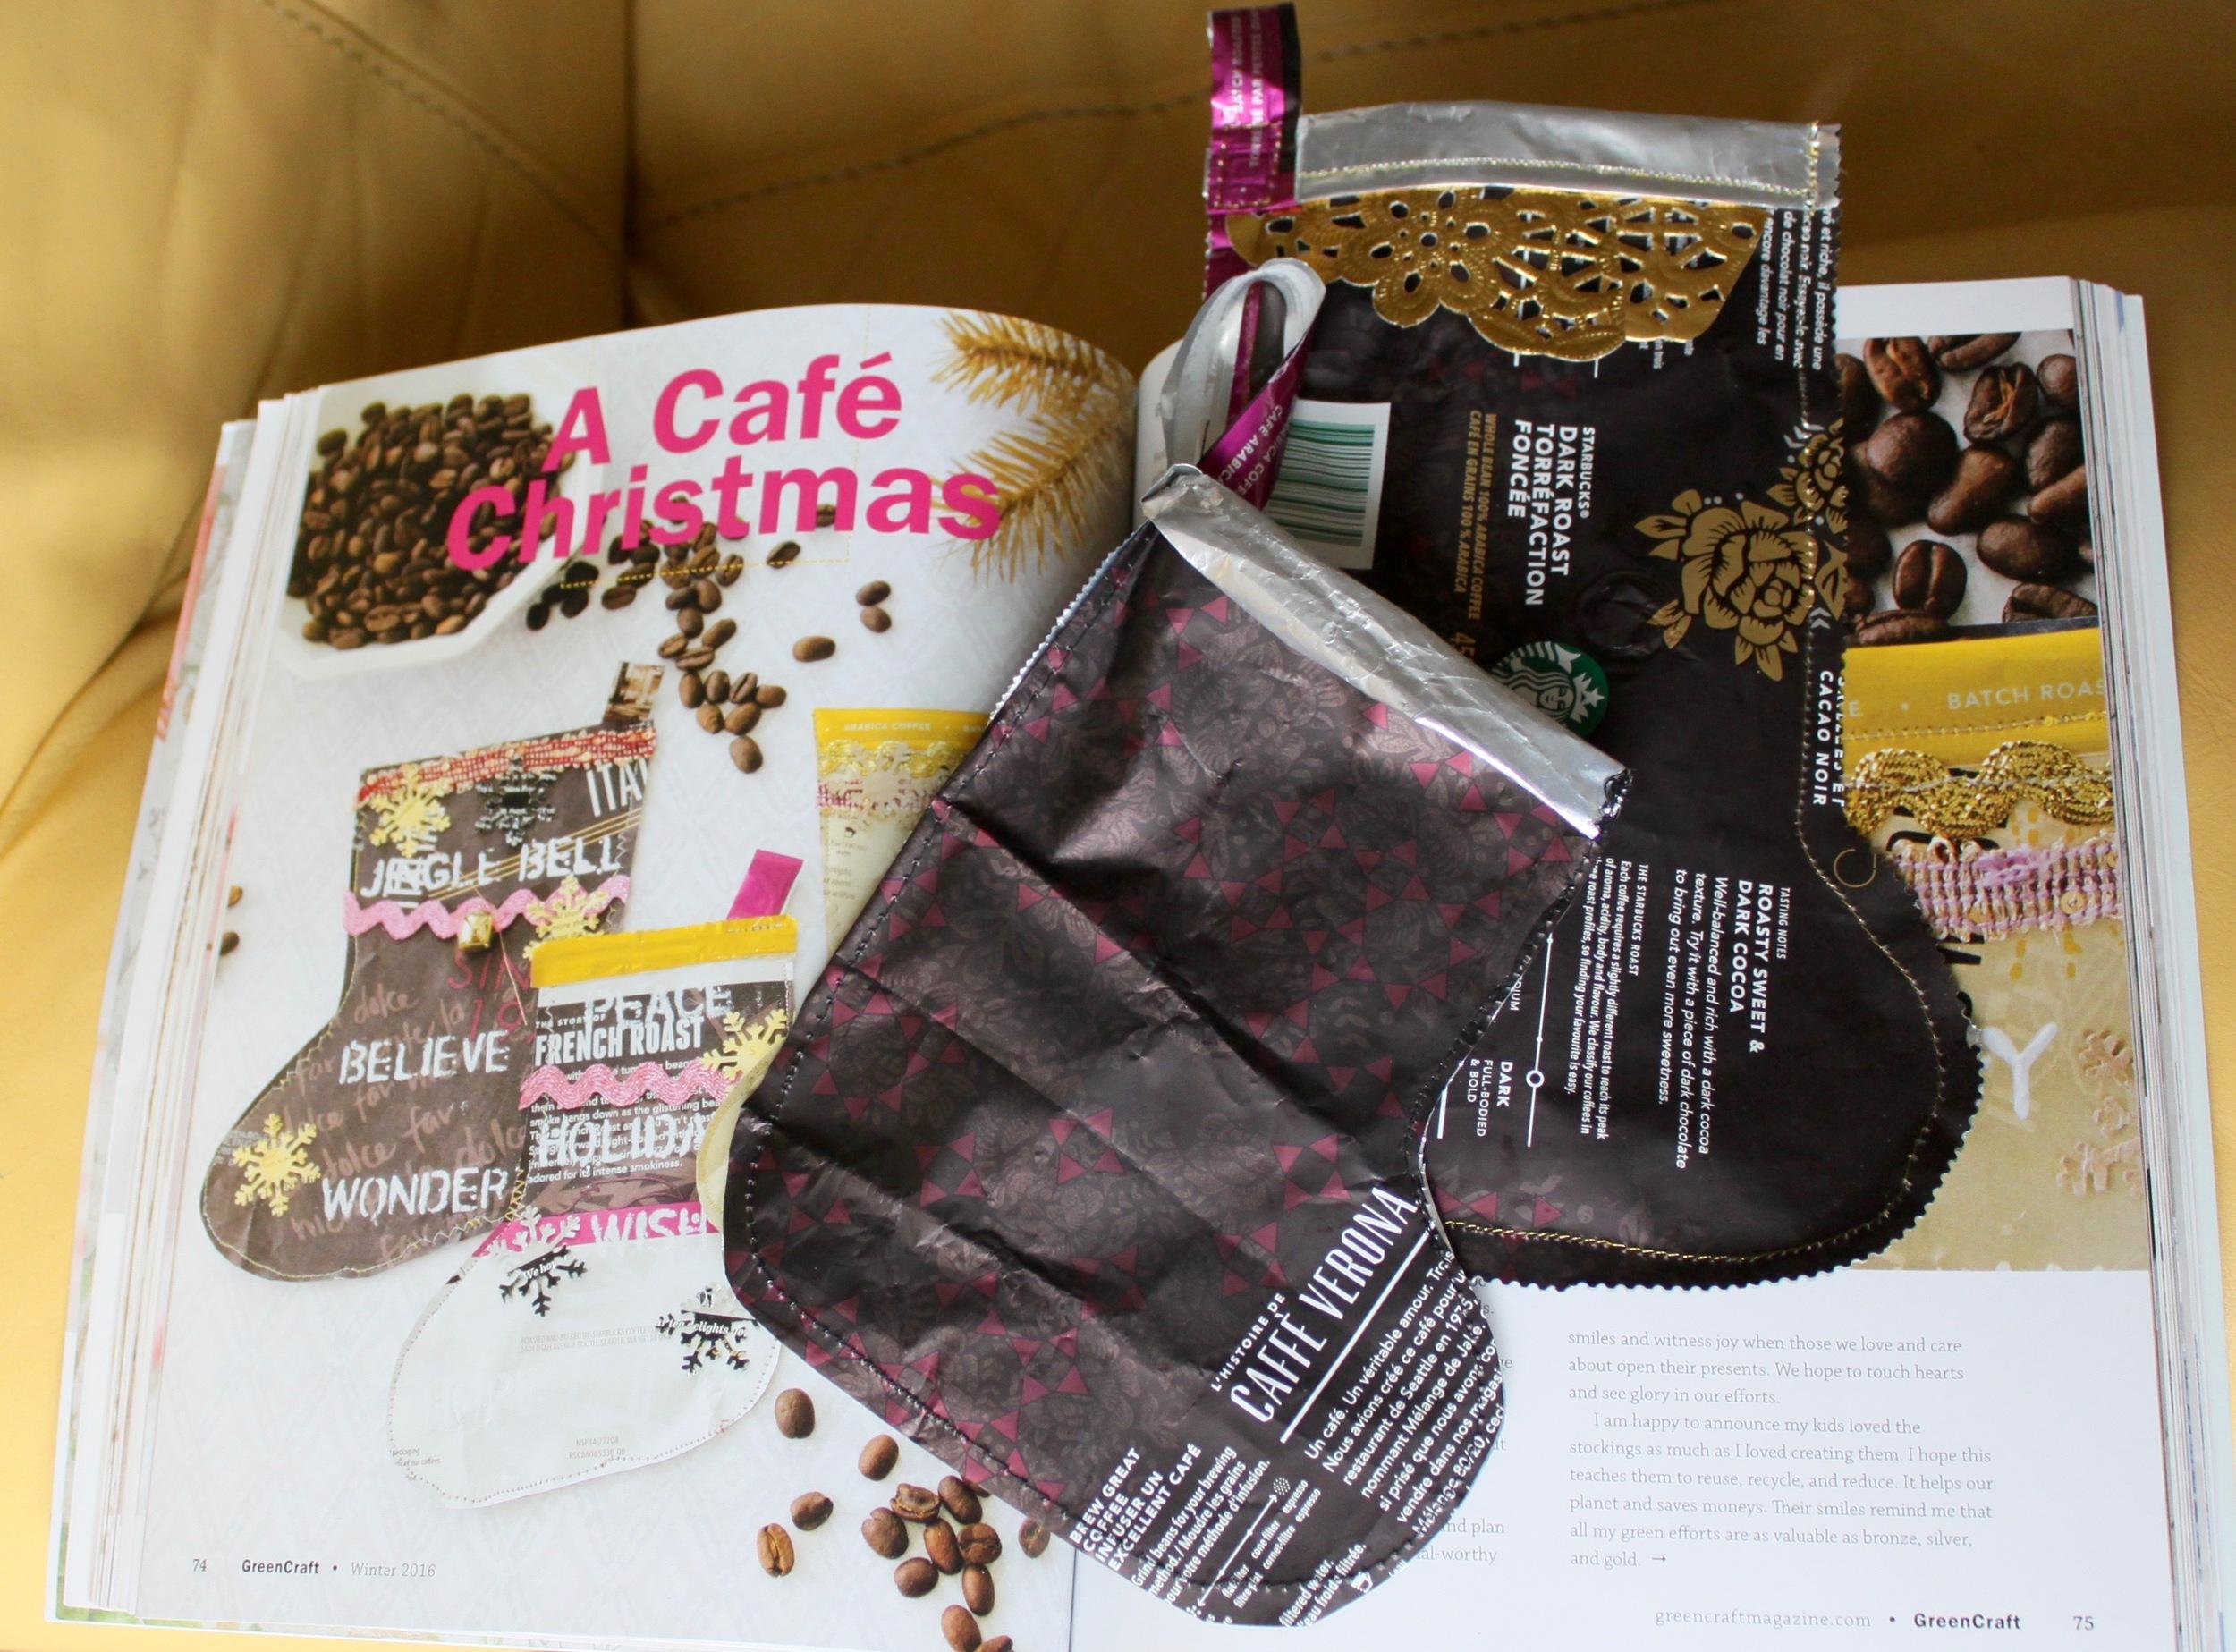 A Cafe Christmas